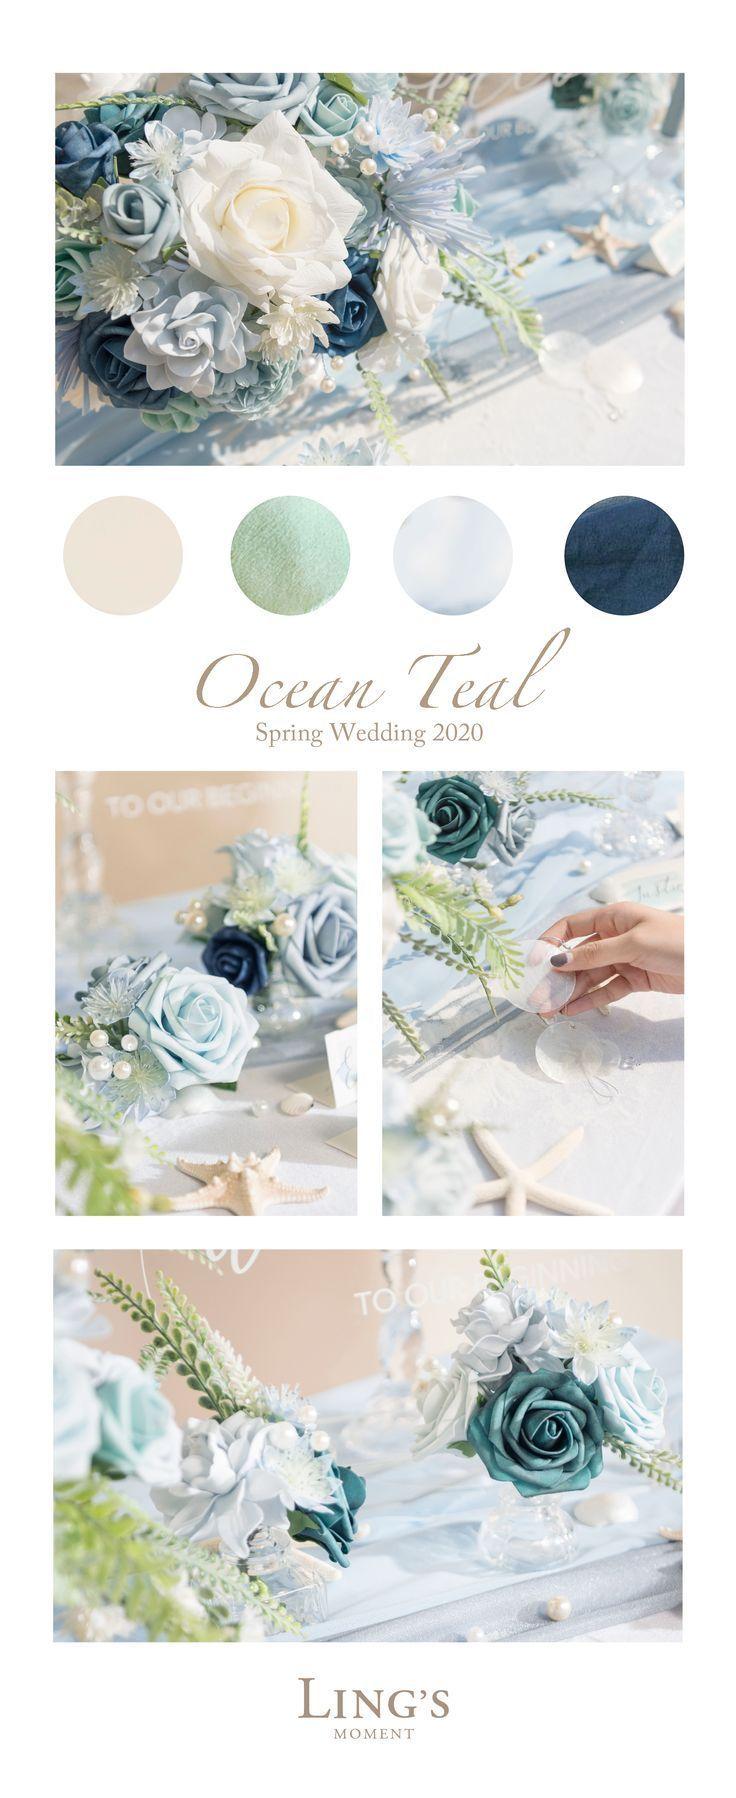 Natural Whites & Ivory Flowers Box Set - 15 Styles